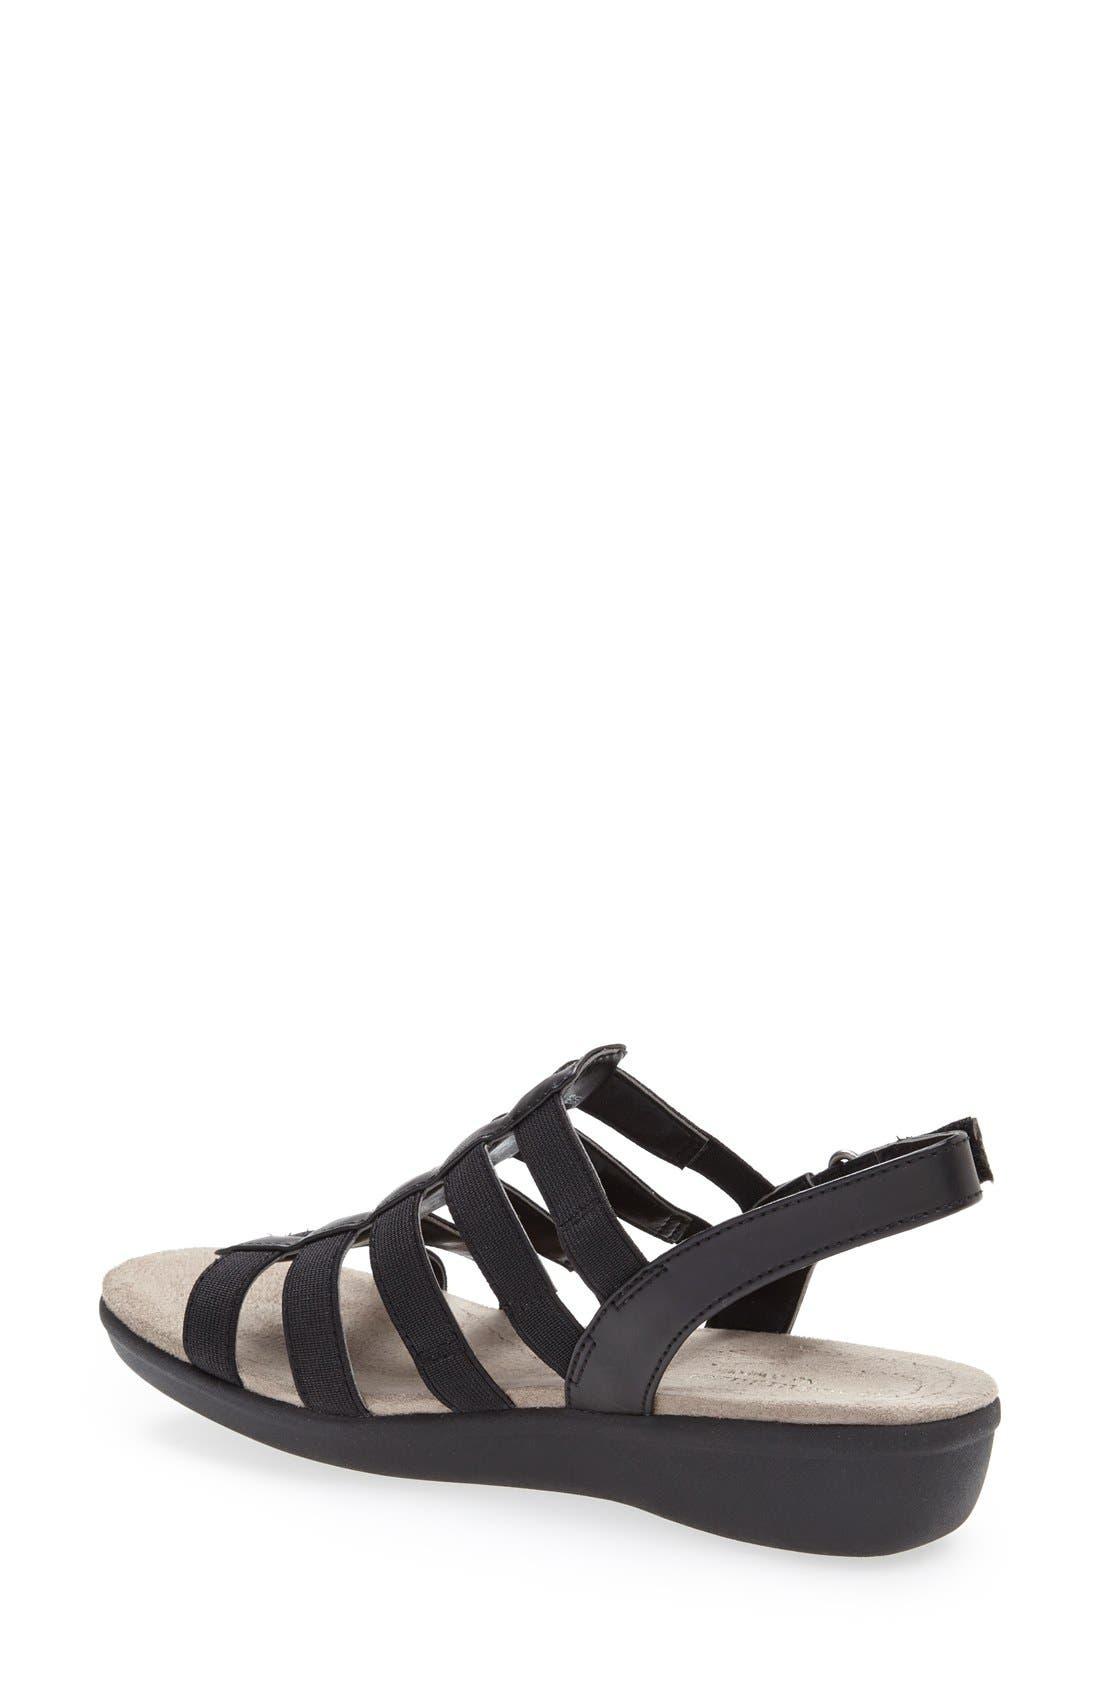 Alternate Image 2  - Naturalizer 'Wyonna' Leather Sandal (Women)